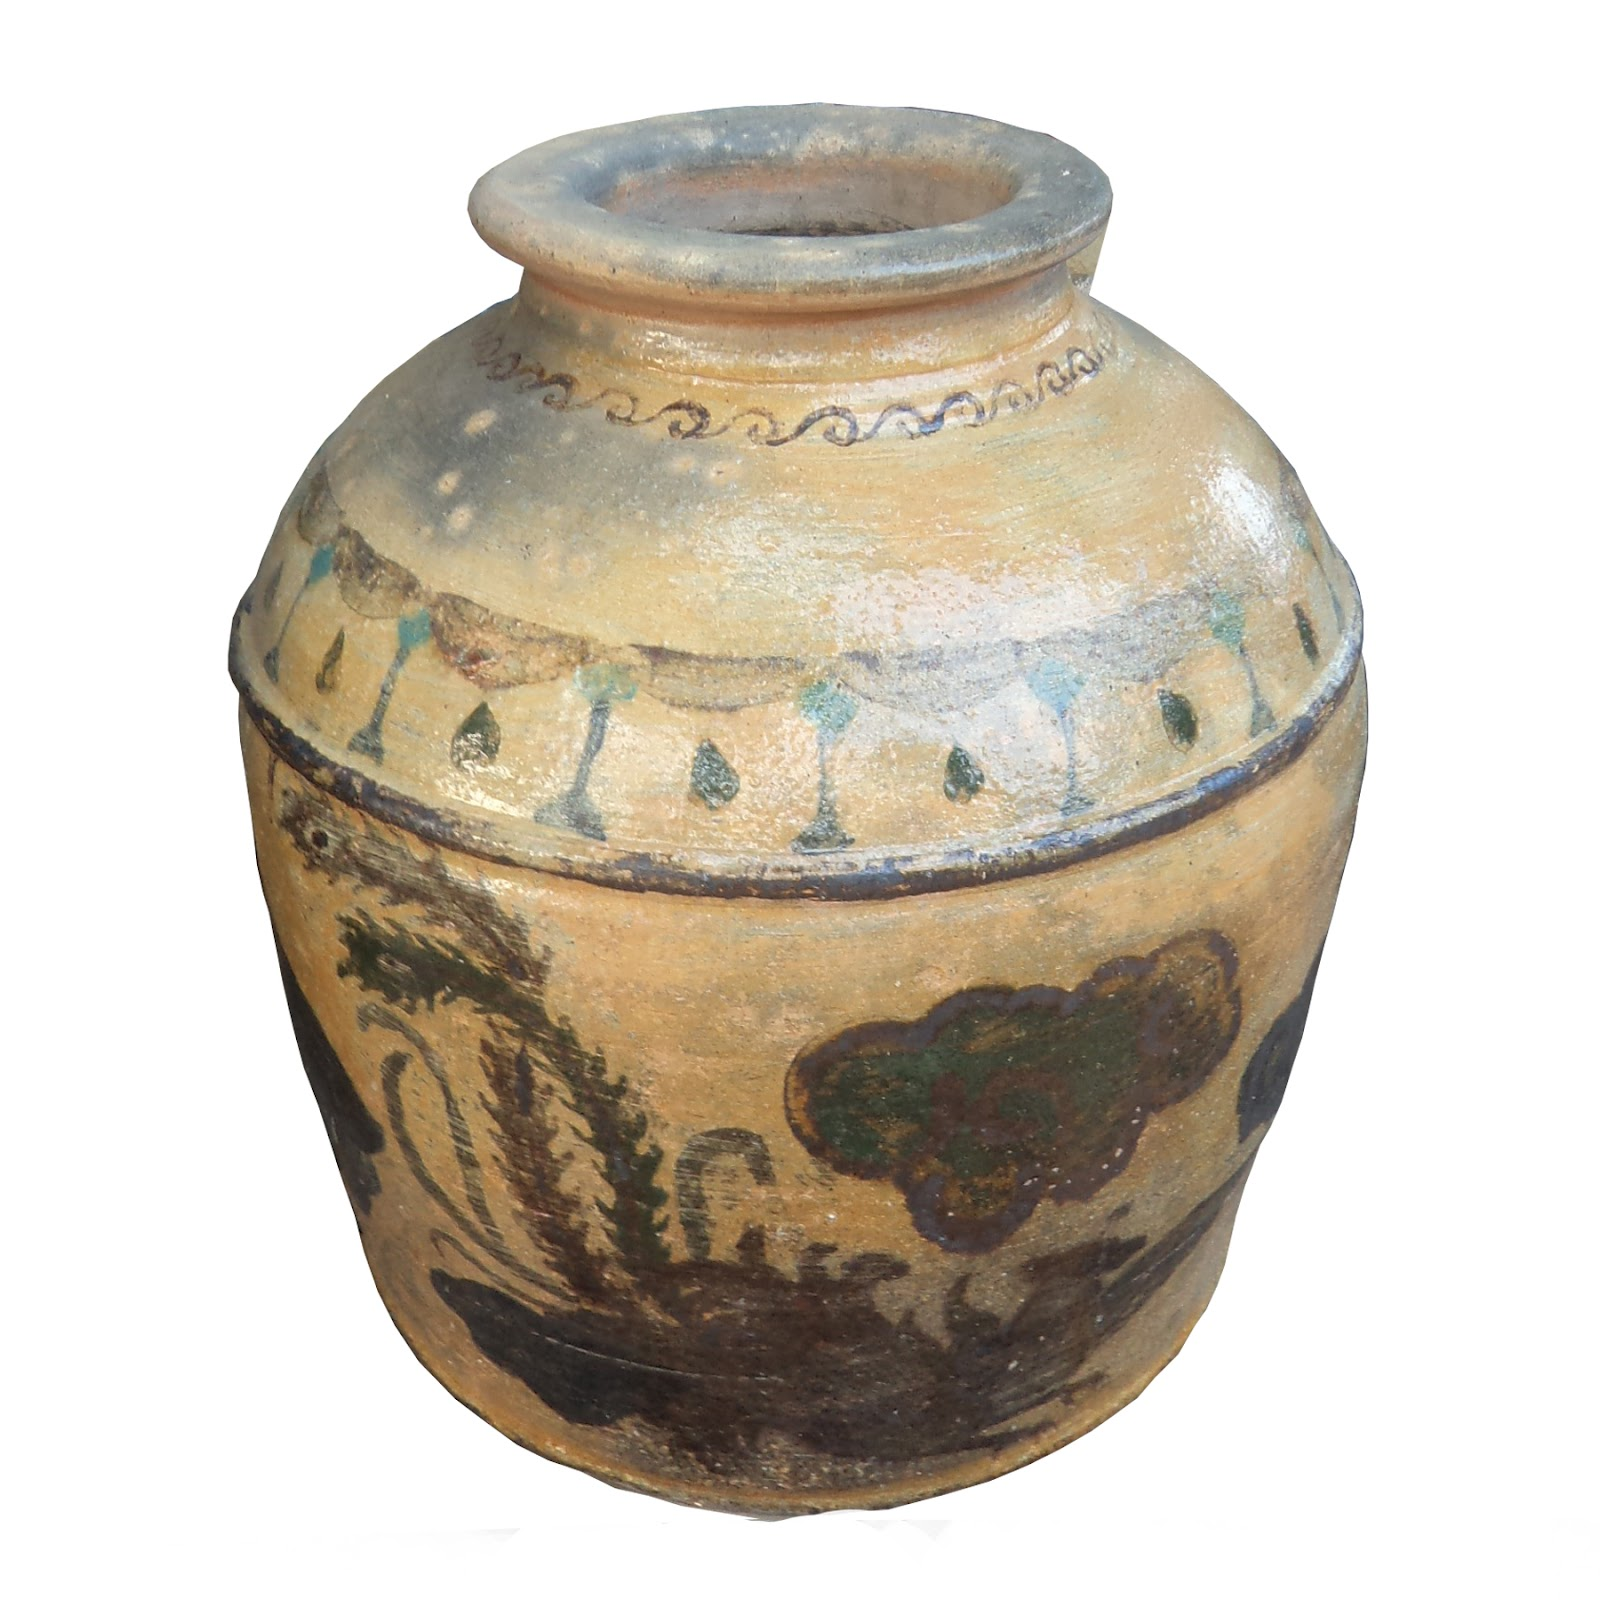 GERABAH NUSANTARA: Guci Motif China Kuno